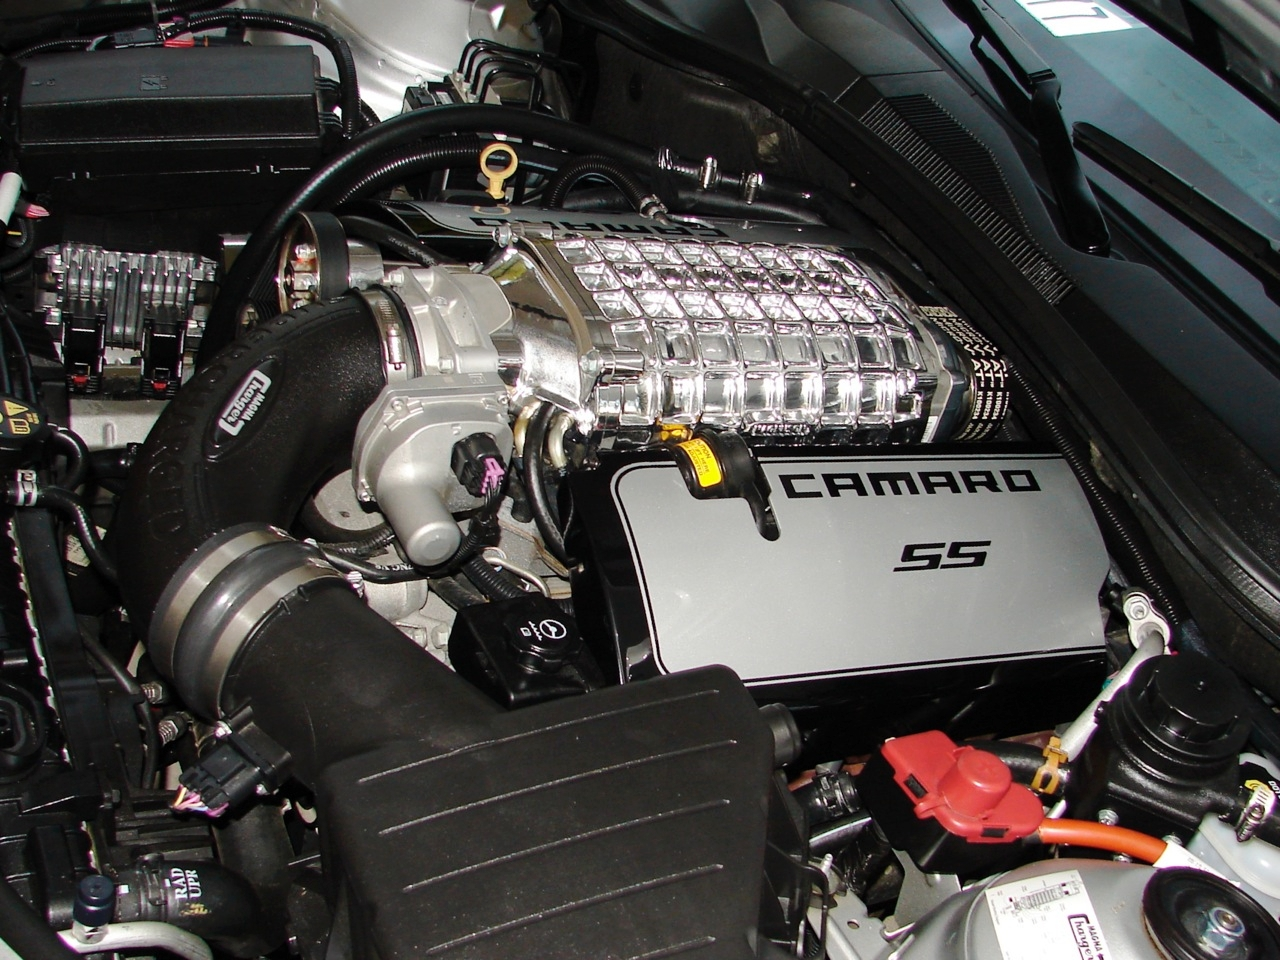 C6 Corvette Performance 2011 Camaro Ss Fuse Box Cover 2010 13 2300 Supercharger Engine Covers Aluminum